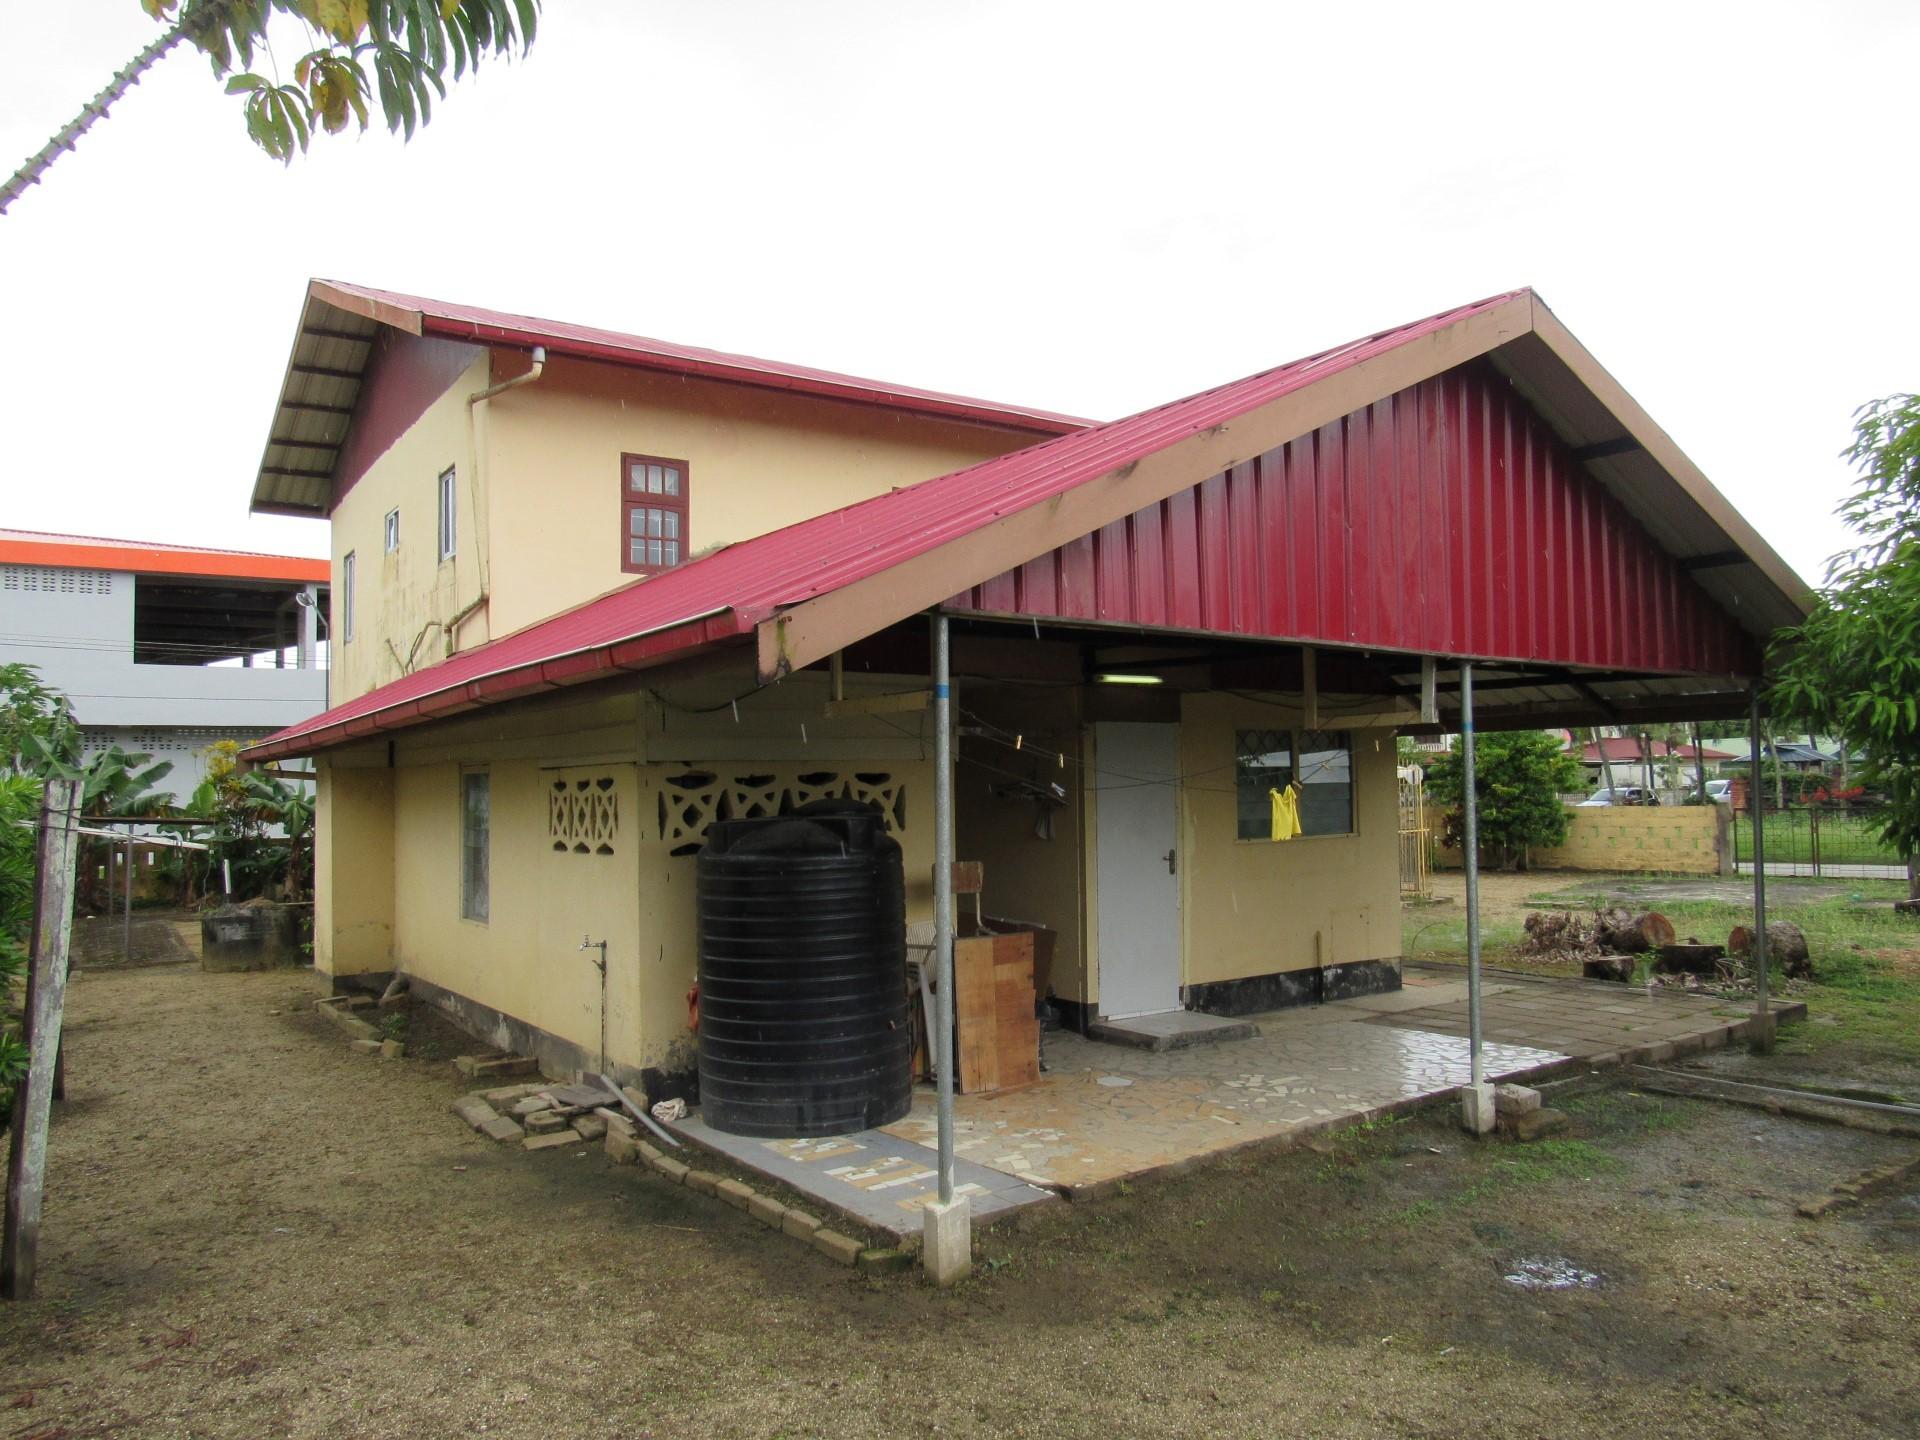 Henkielaan-32-Koopwoning-Terzol-Vastgoed-Paramaribo-Suriname-32